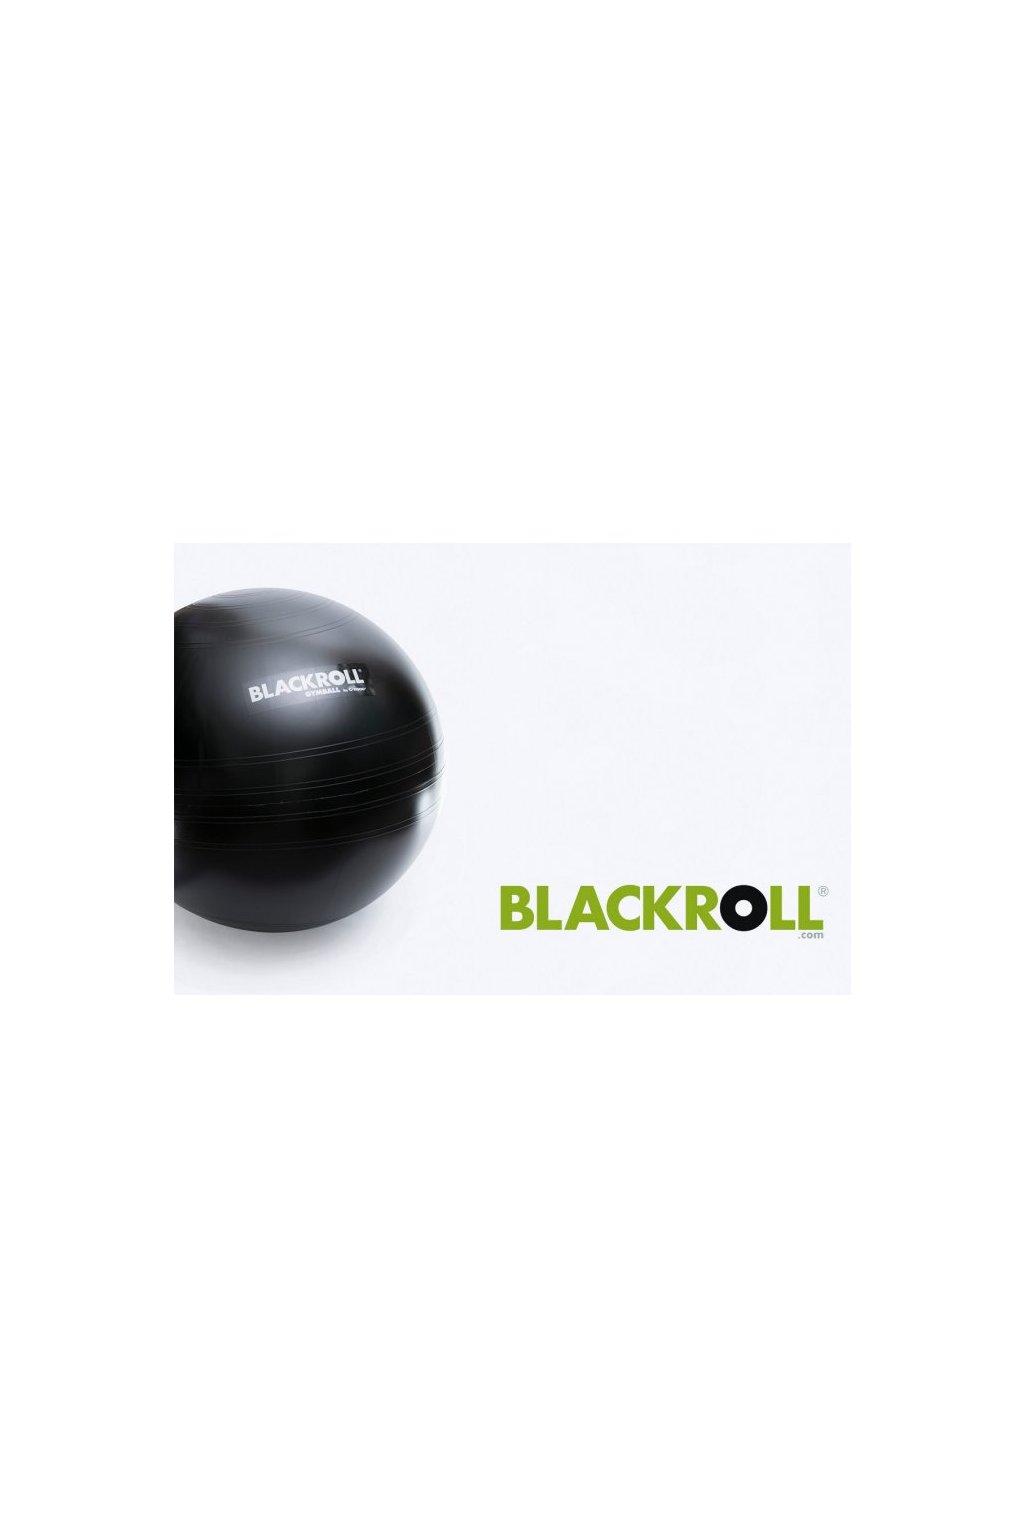 2368 1 blackroll gymball65 web(1)